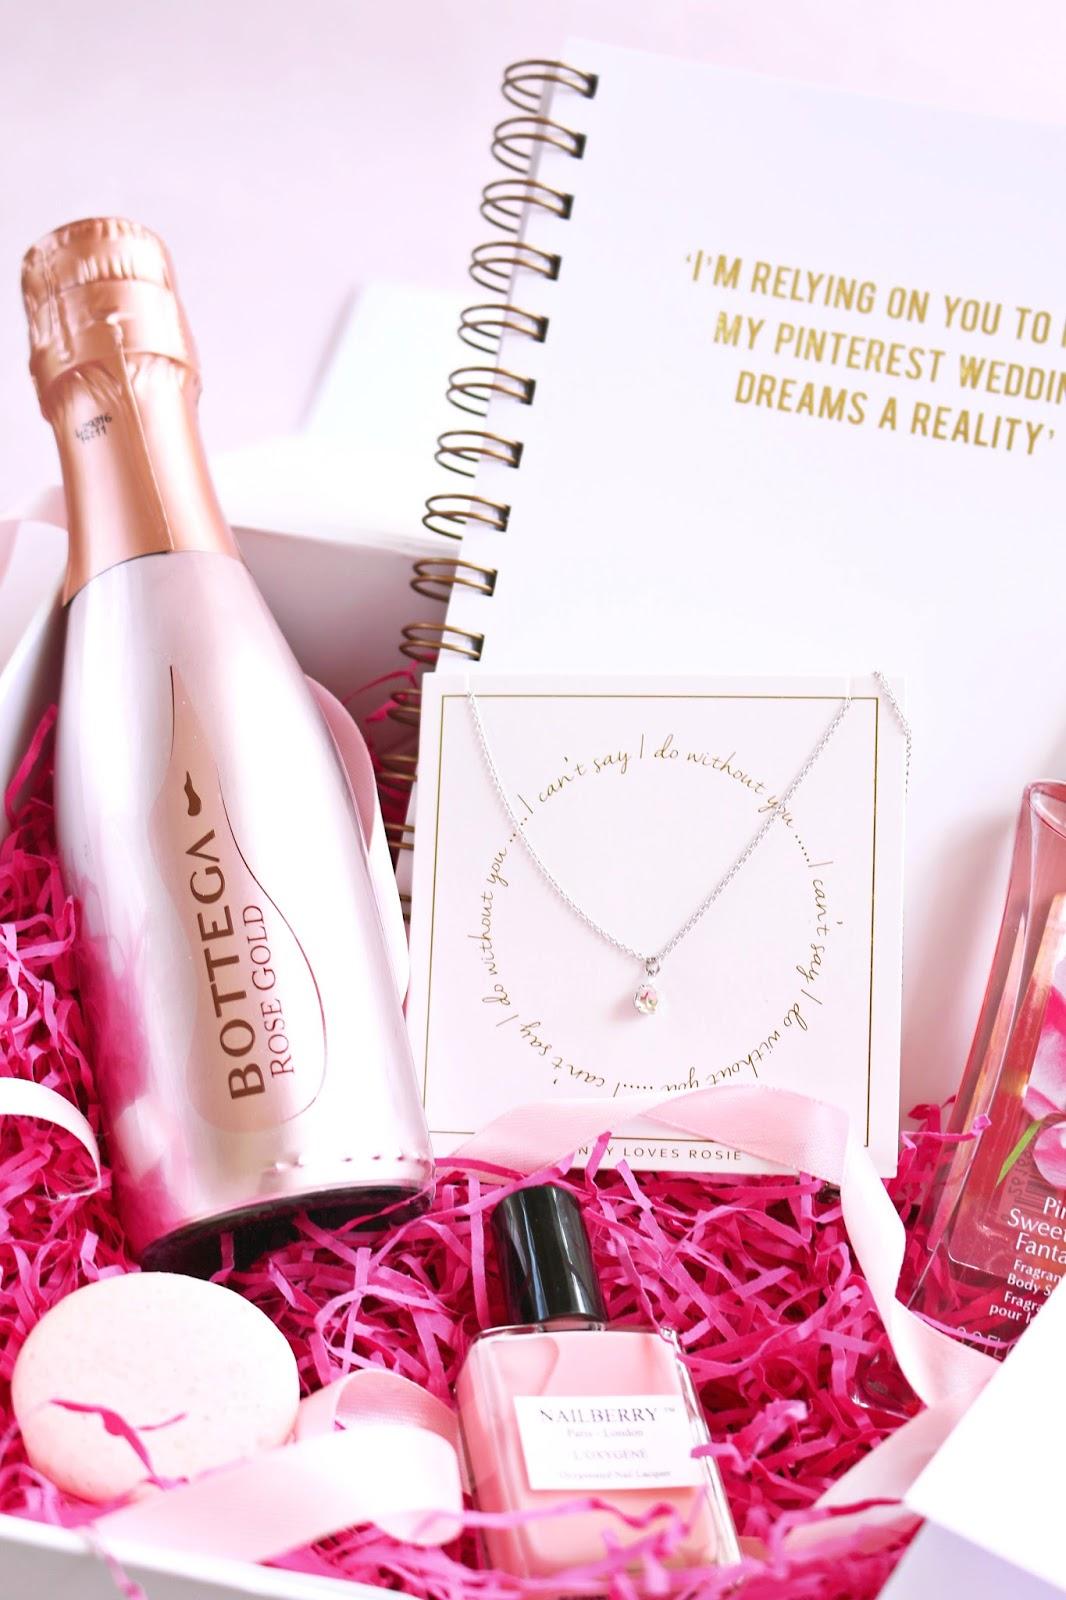 DIY: Will You Be My Bridesmaid Box, Bridesmaid Box, bridal, wedding, wedding gifts, what to buy your bridesmaid, engaged, wedding gift,